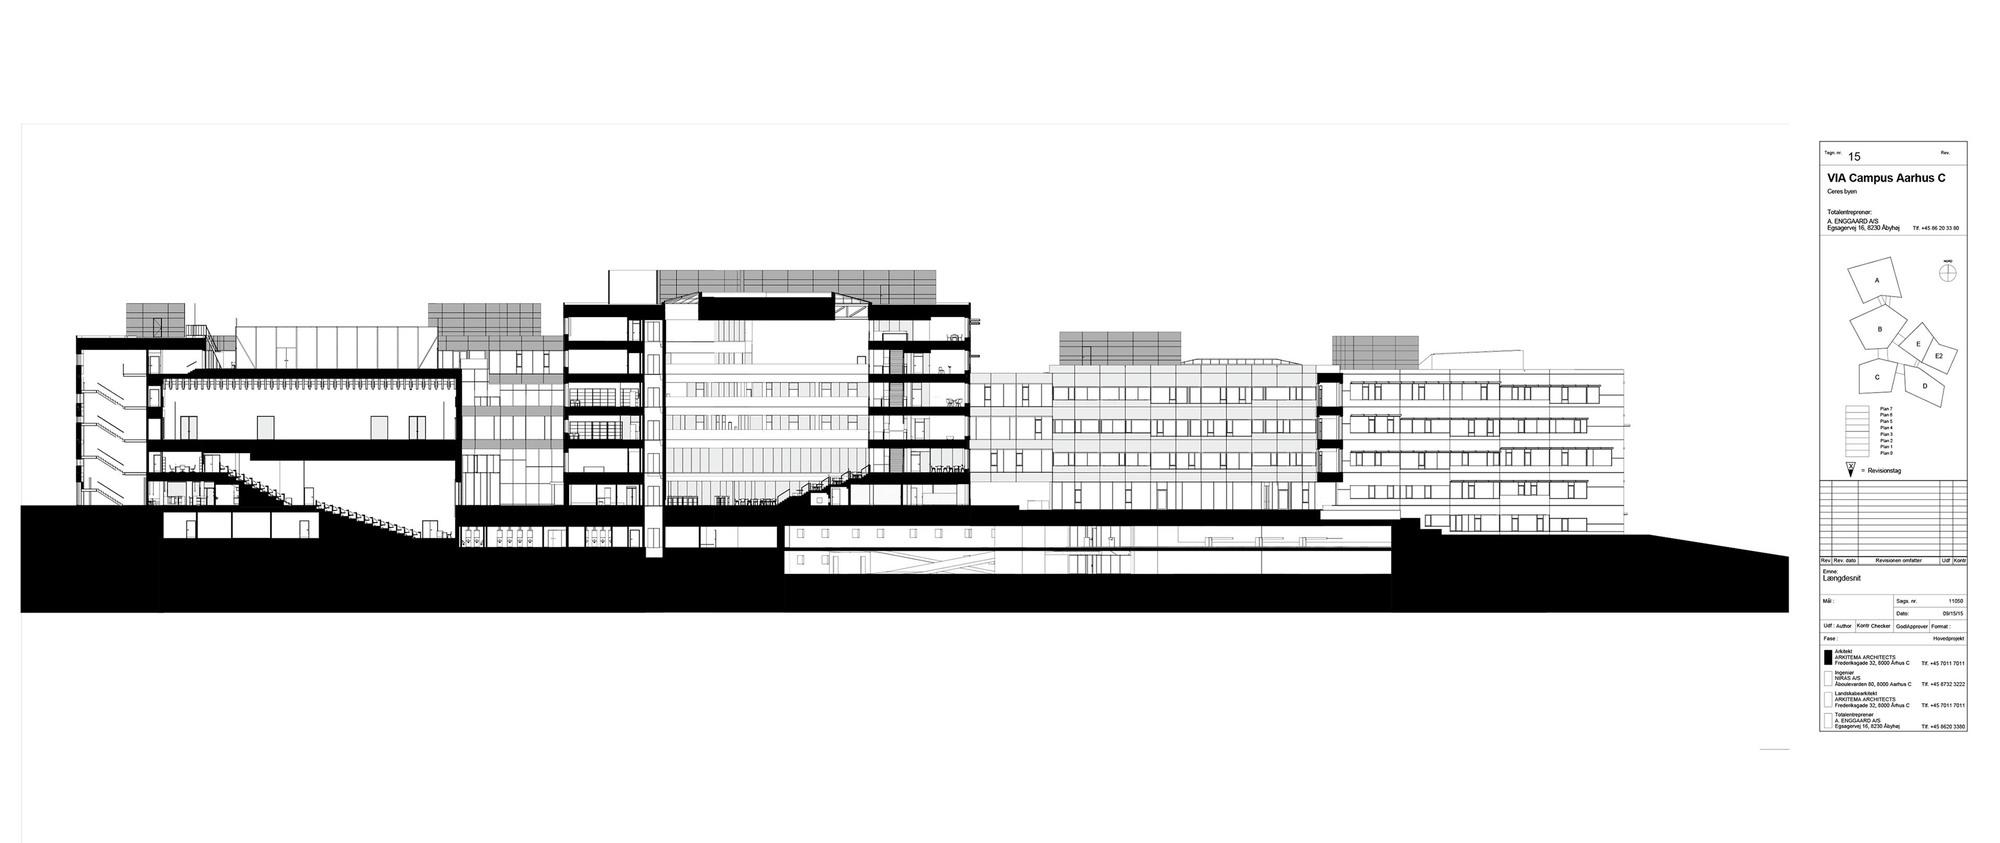 VIA University College Aarhus City Arkitema Architects